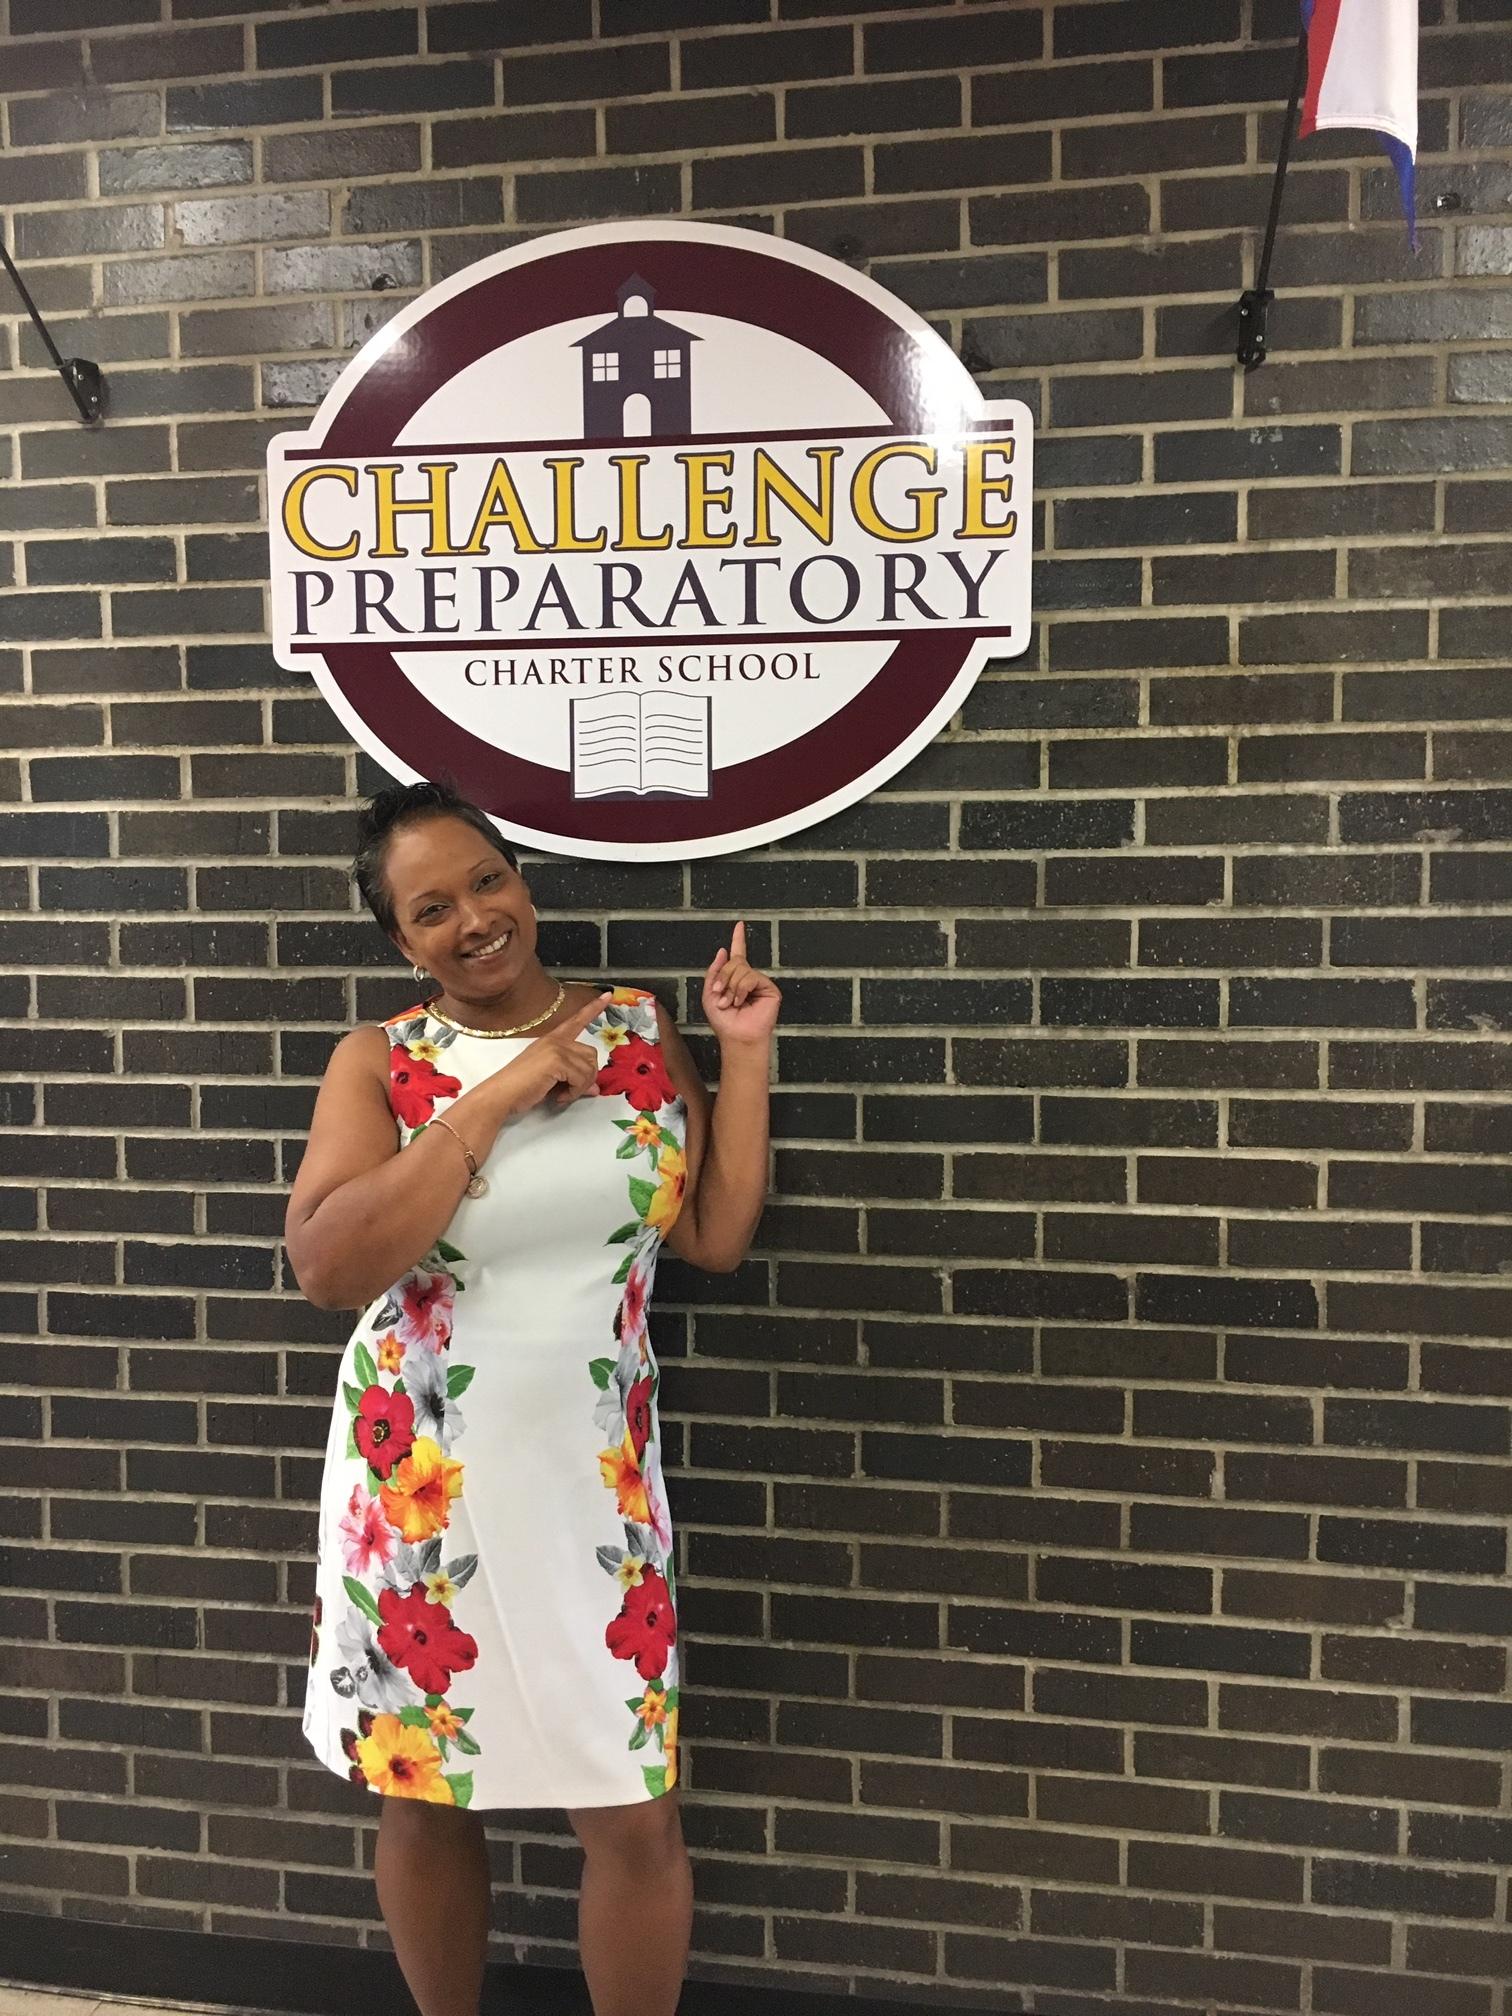 K-5 Principal Administrative Assistant, Mrs. James